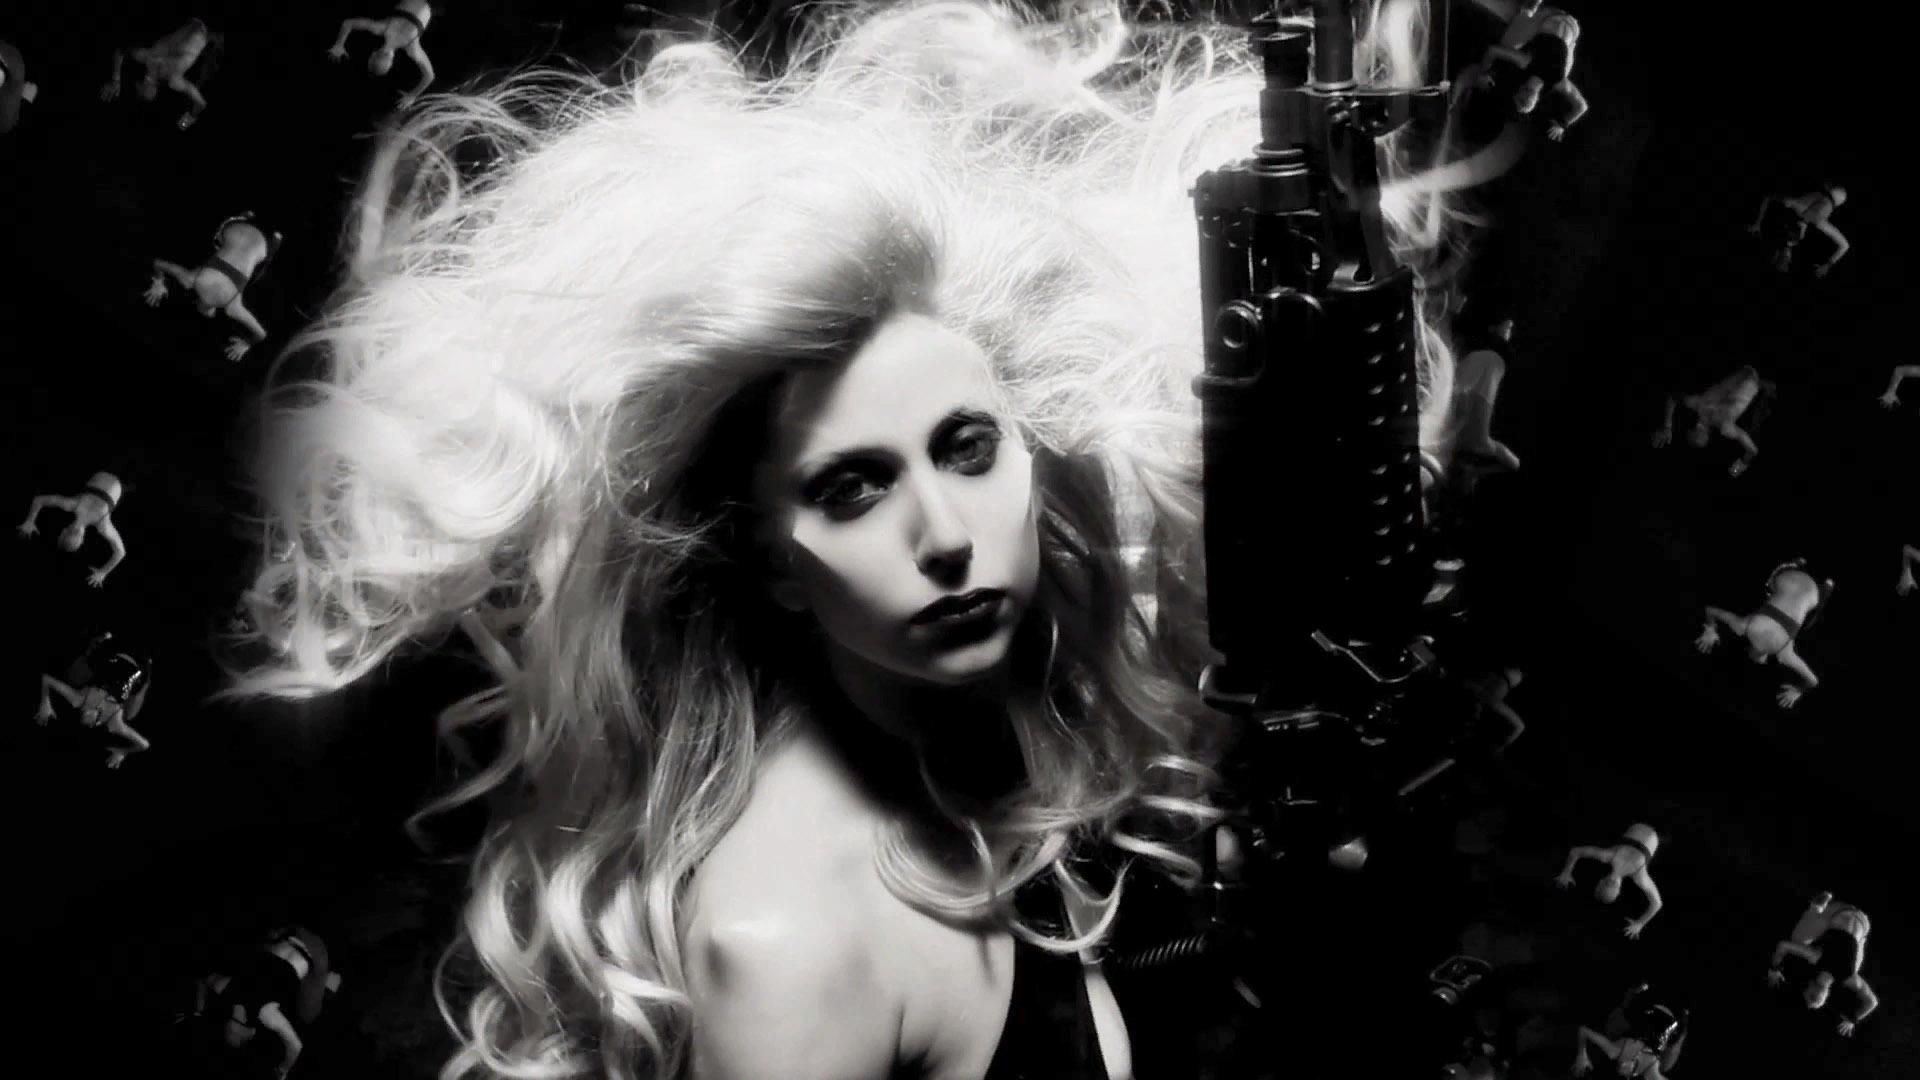 Gaga_Born-This-Way_03